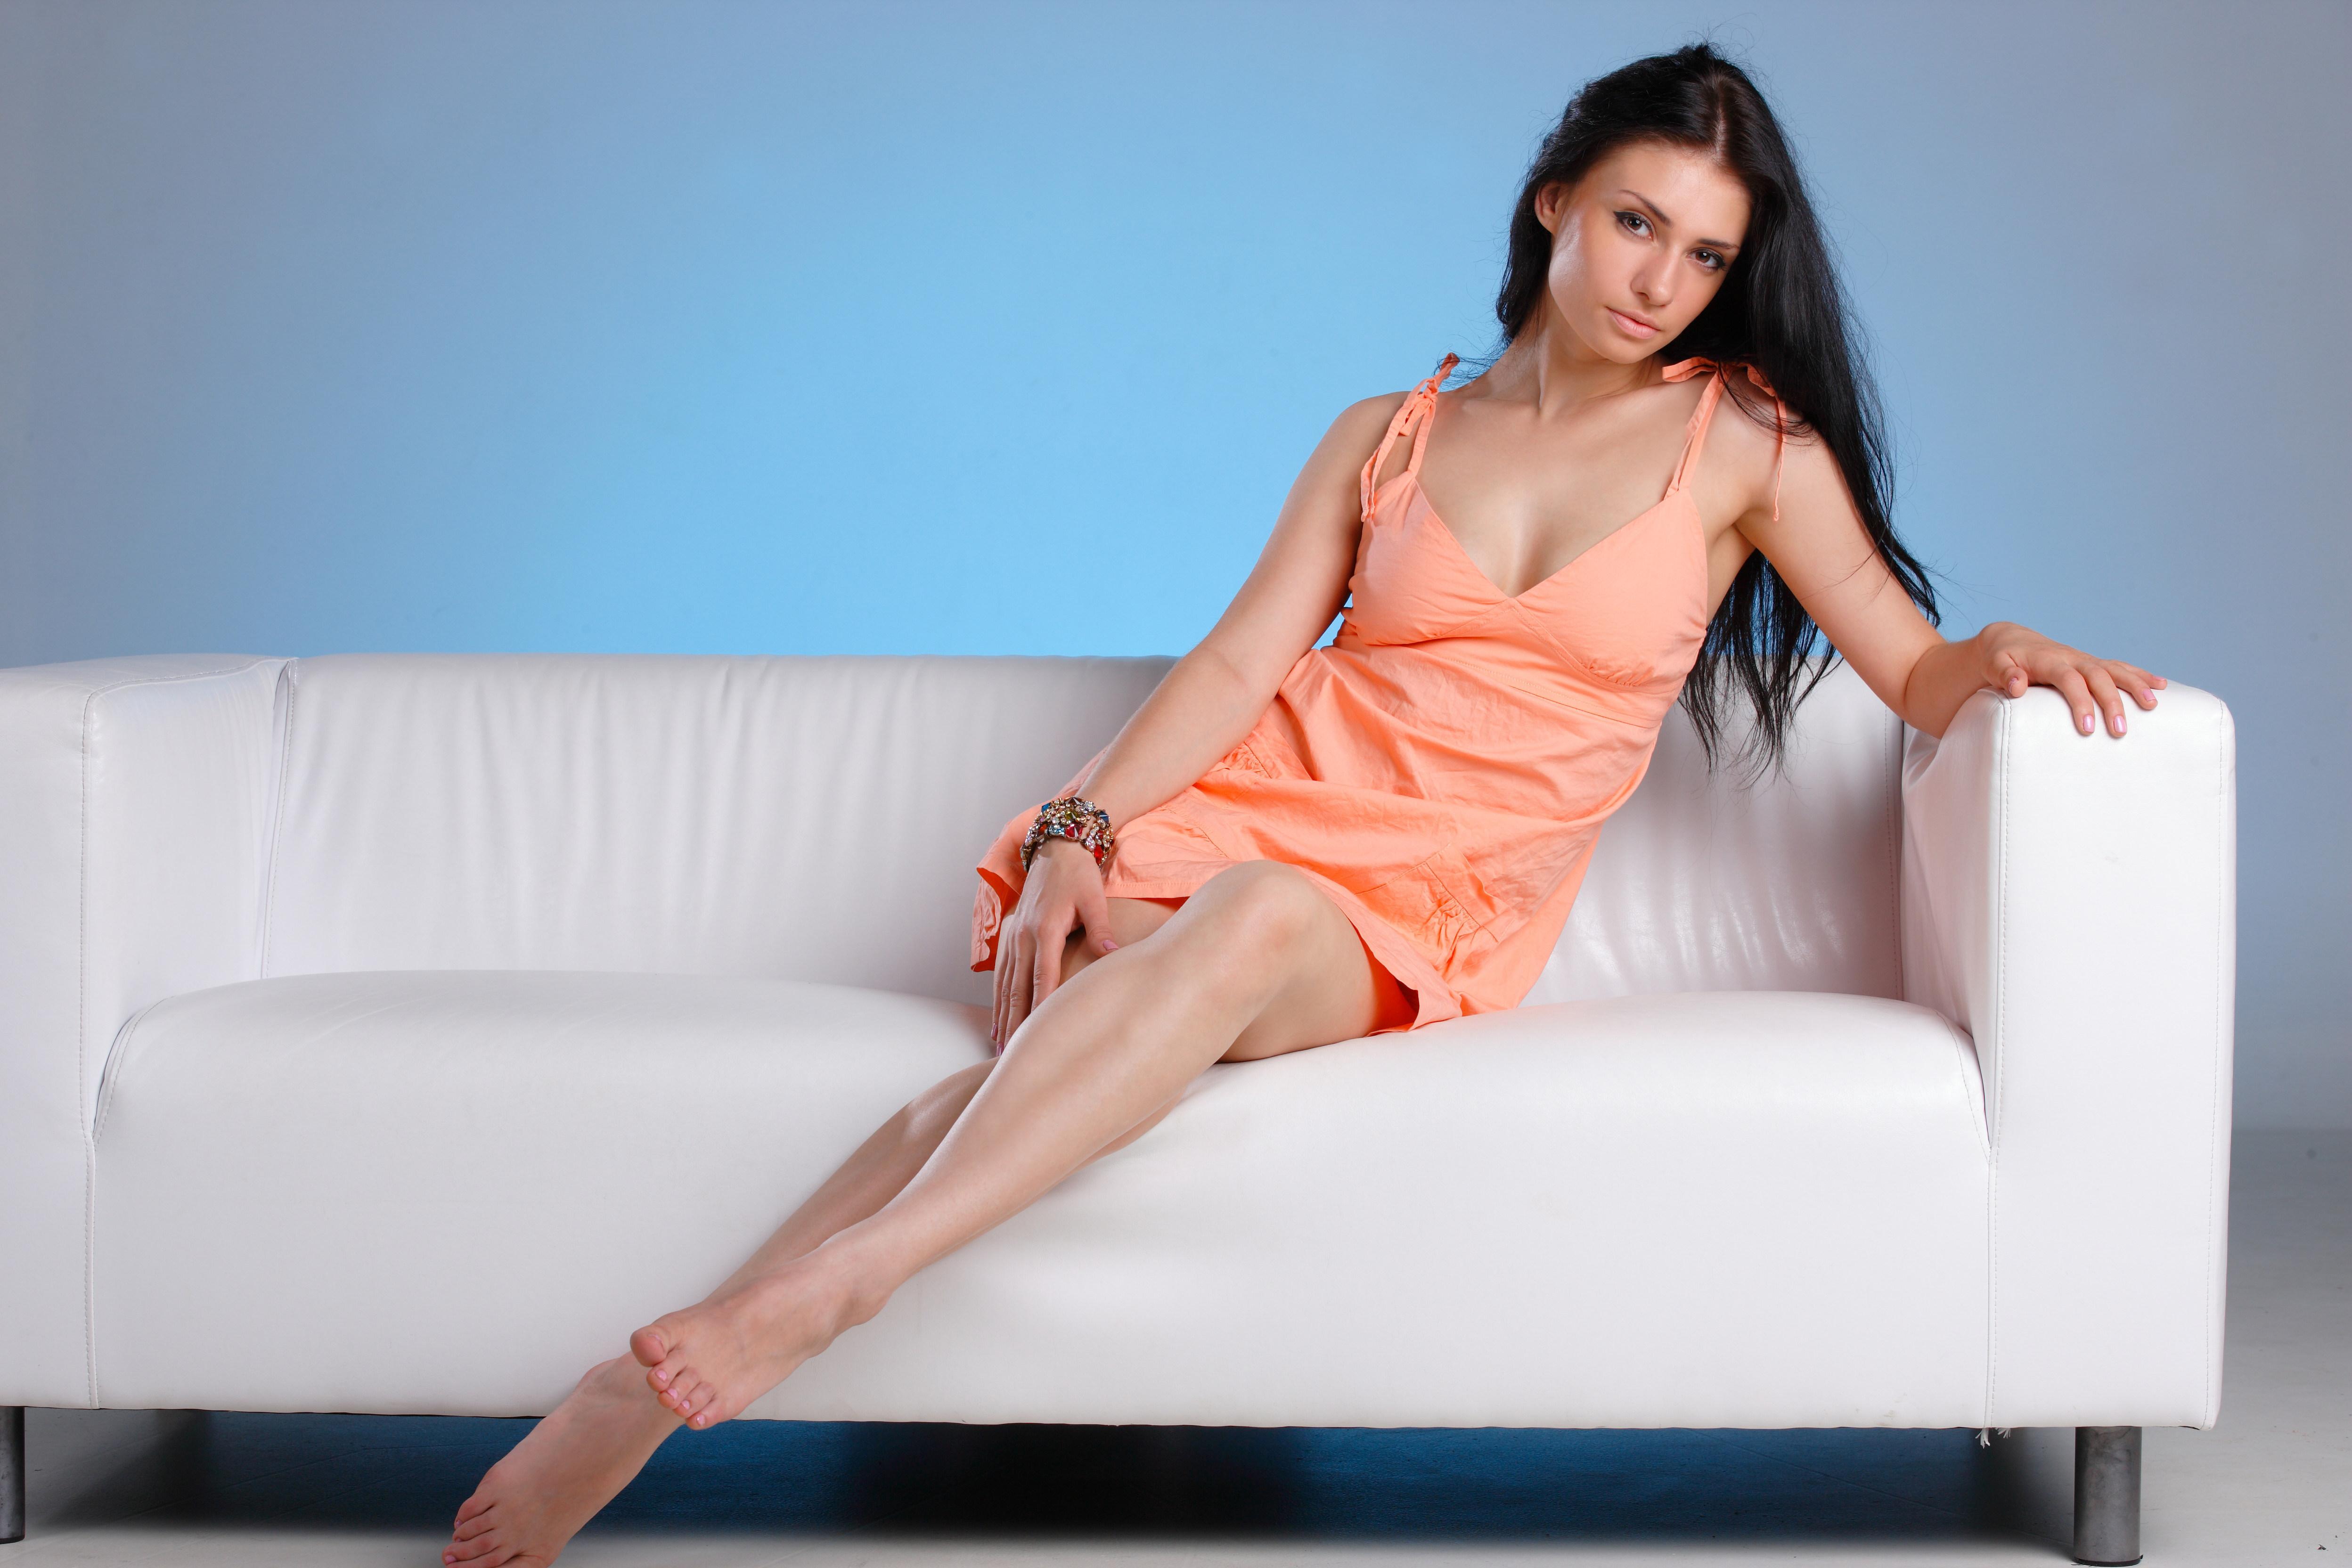 Девушка красивая сидит на диване